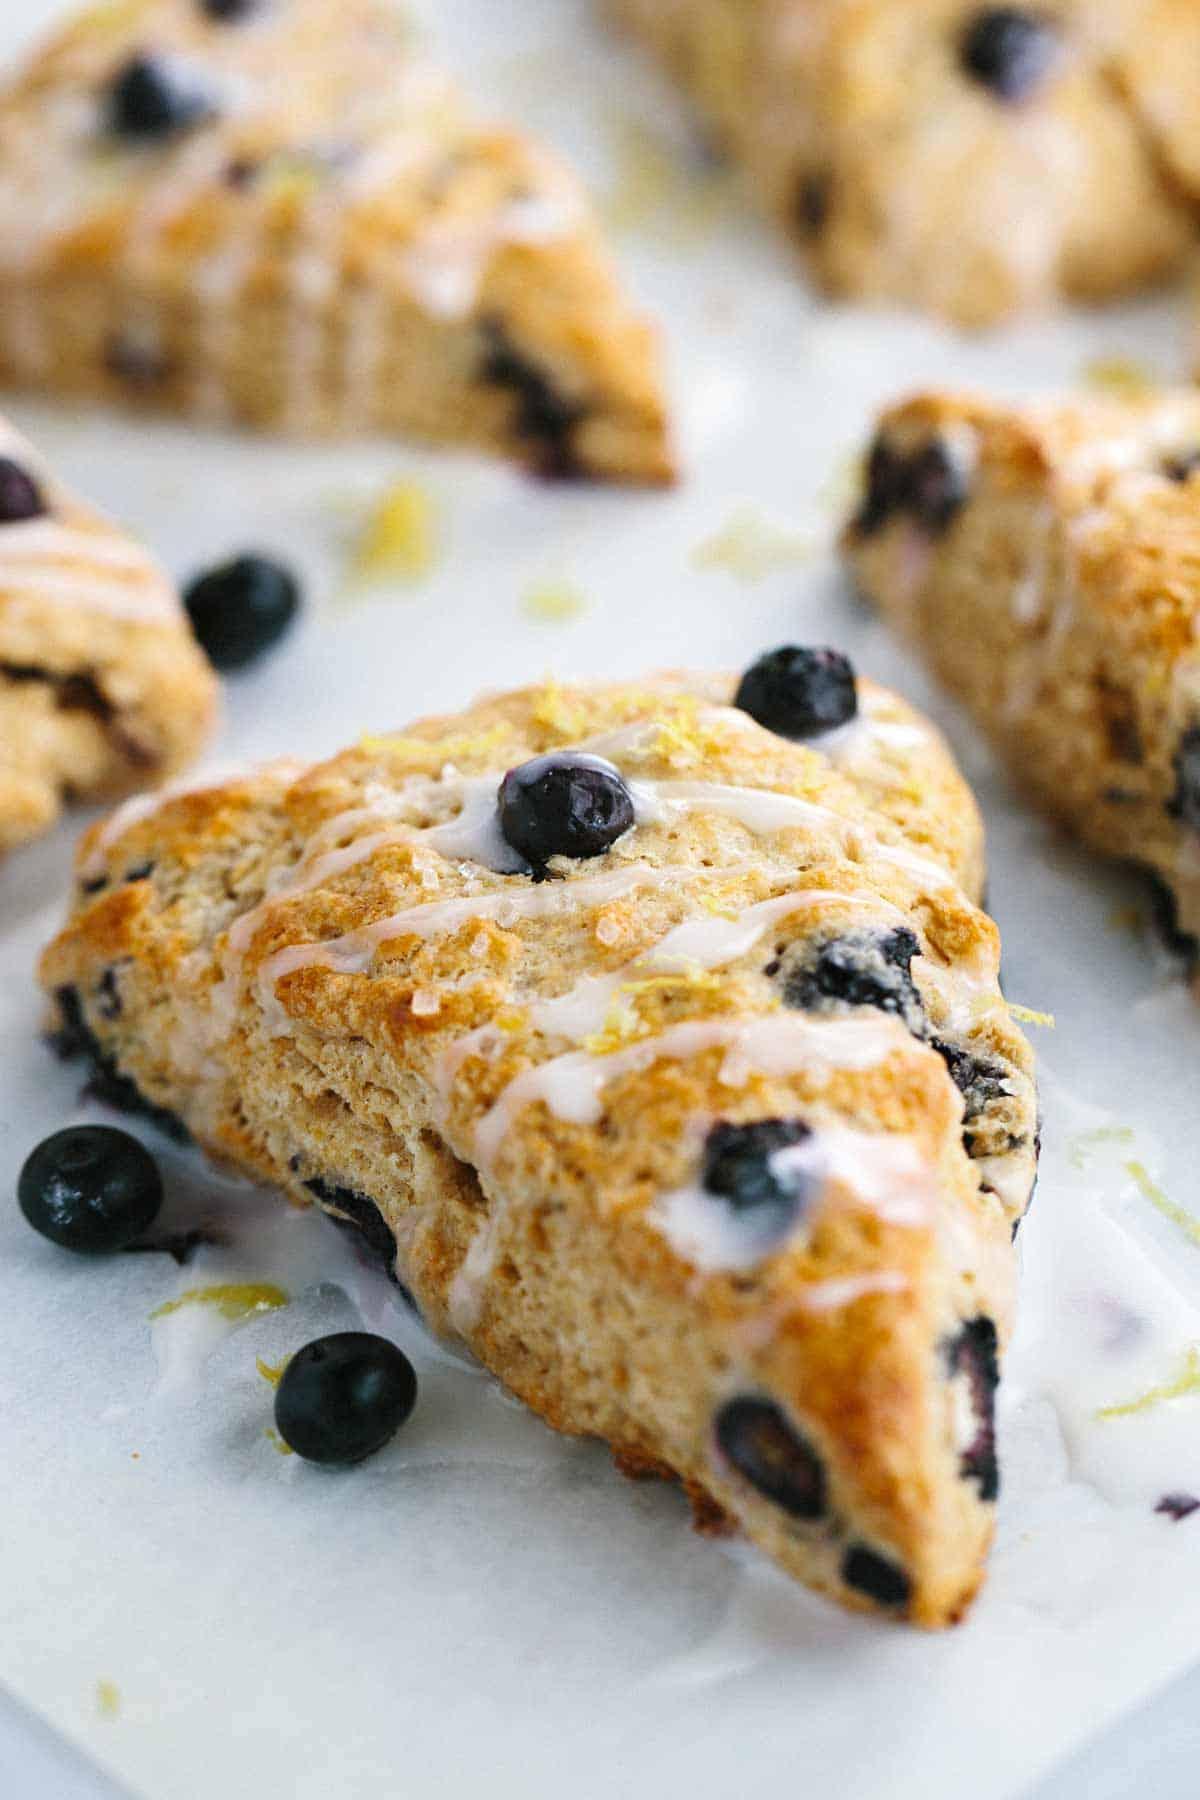 Whole Wheat Blueberry Scones with Lemon Glaze | Jessica Gavin